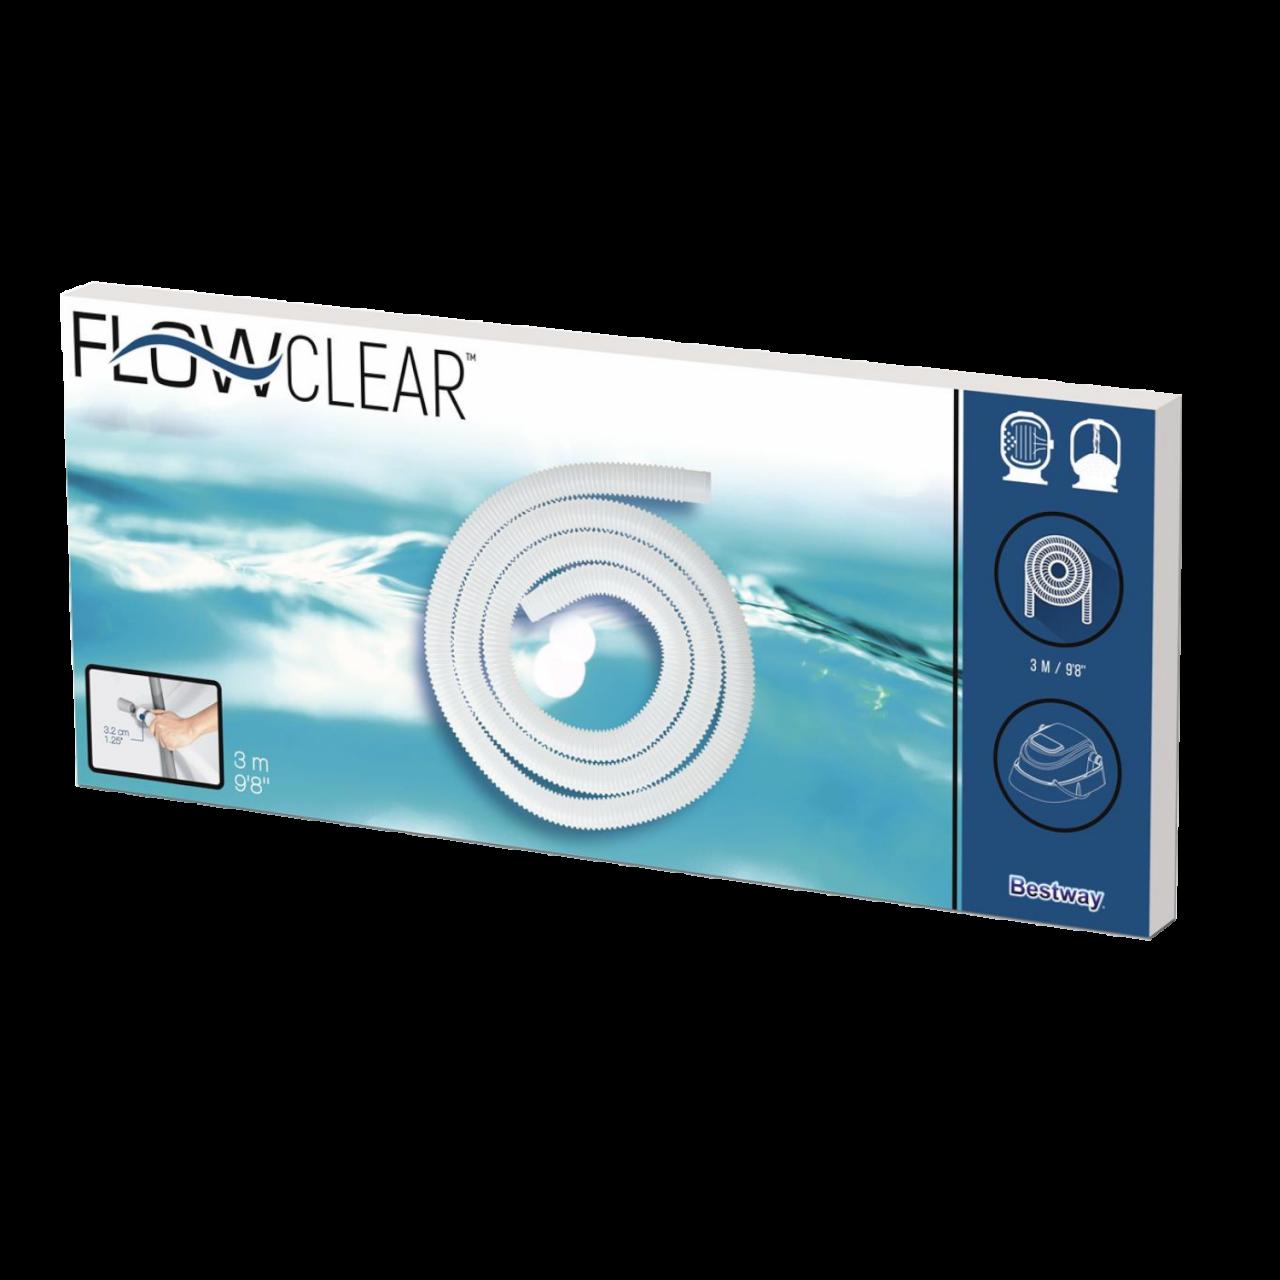 Bestway 58369 Flowclear Universal 32mm Poolschlauch 300cm